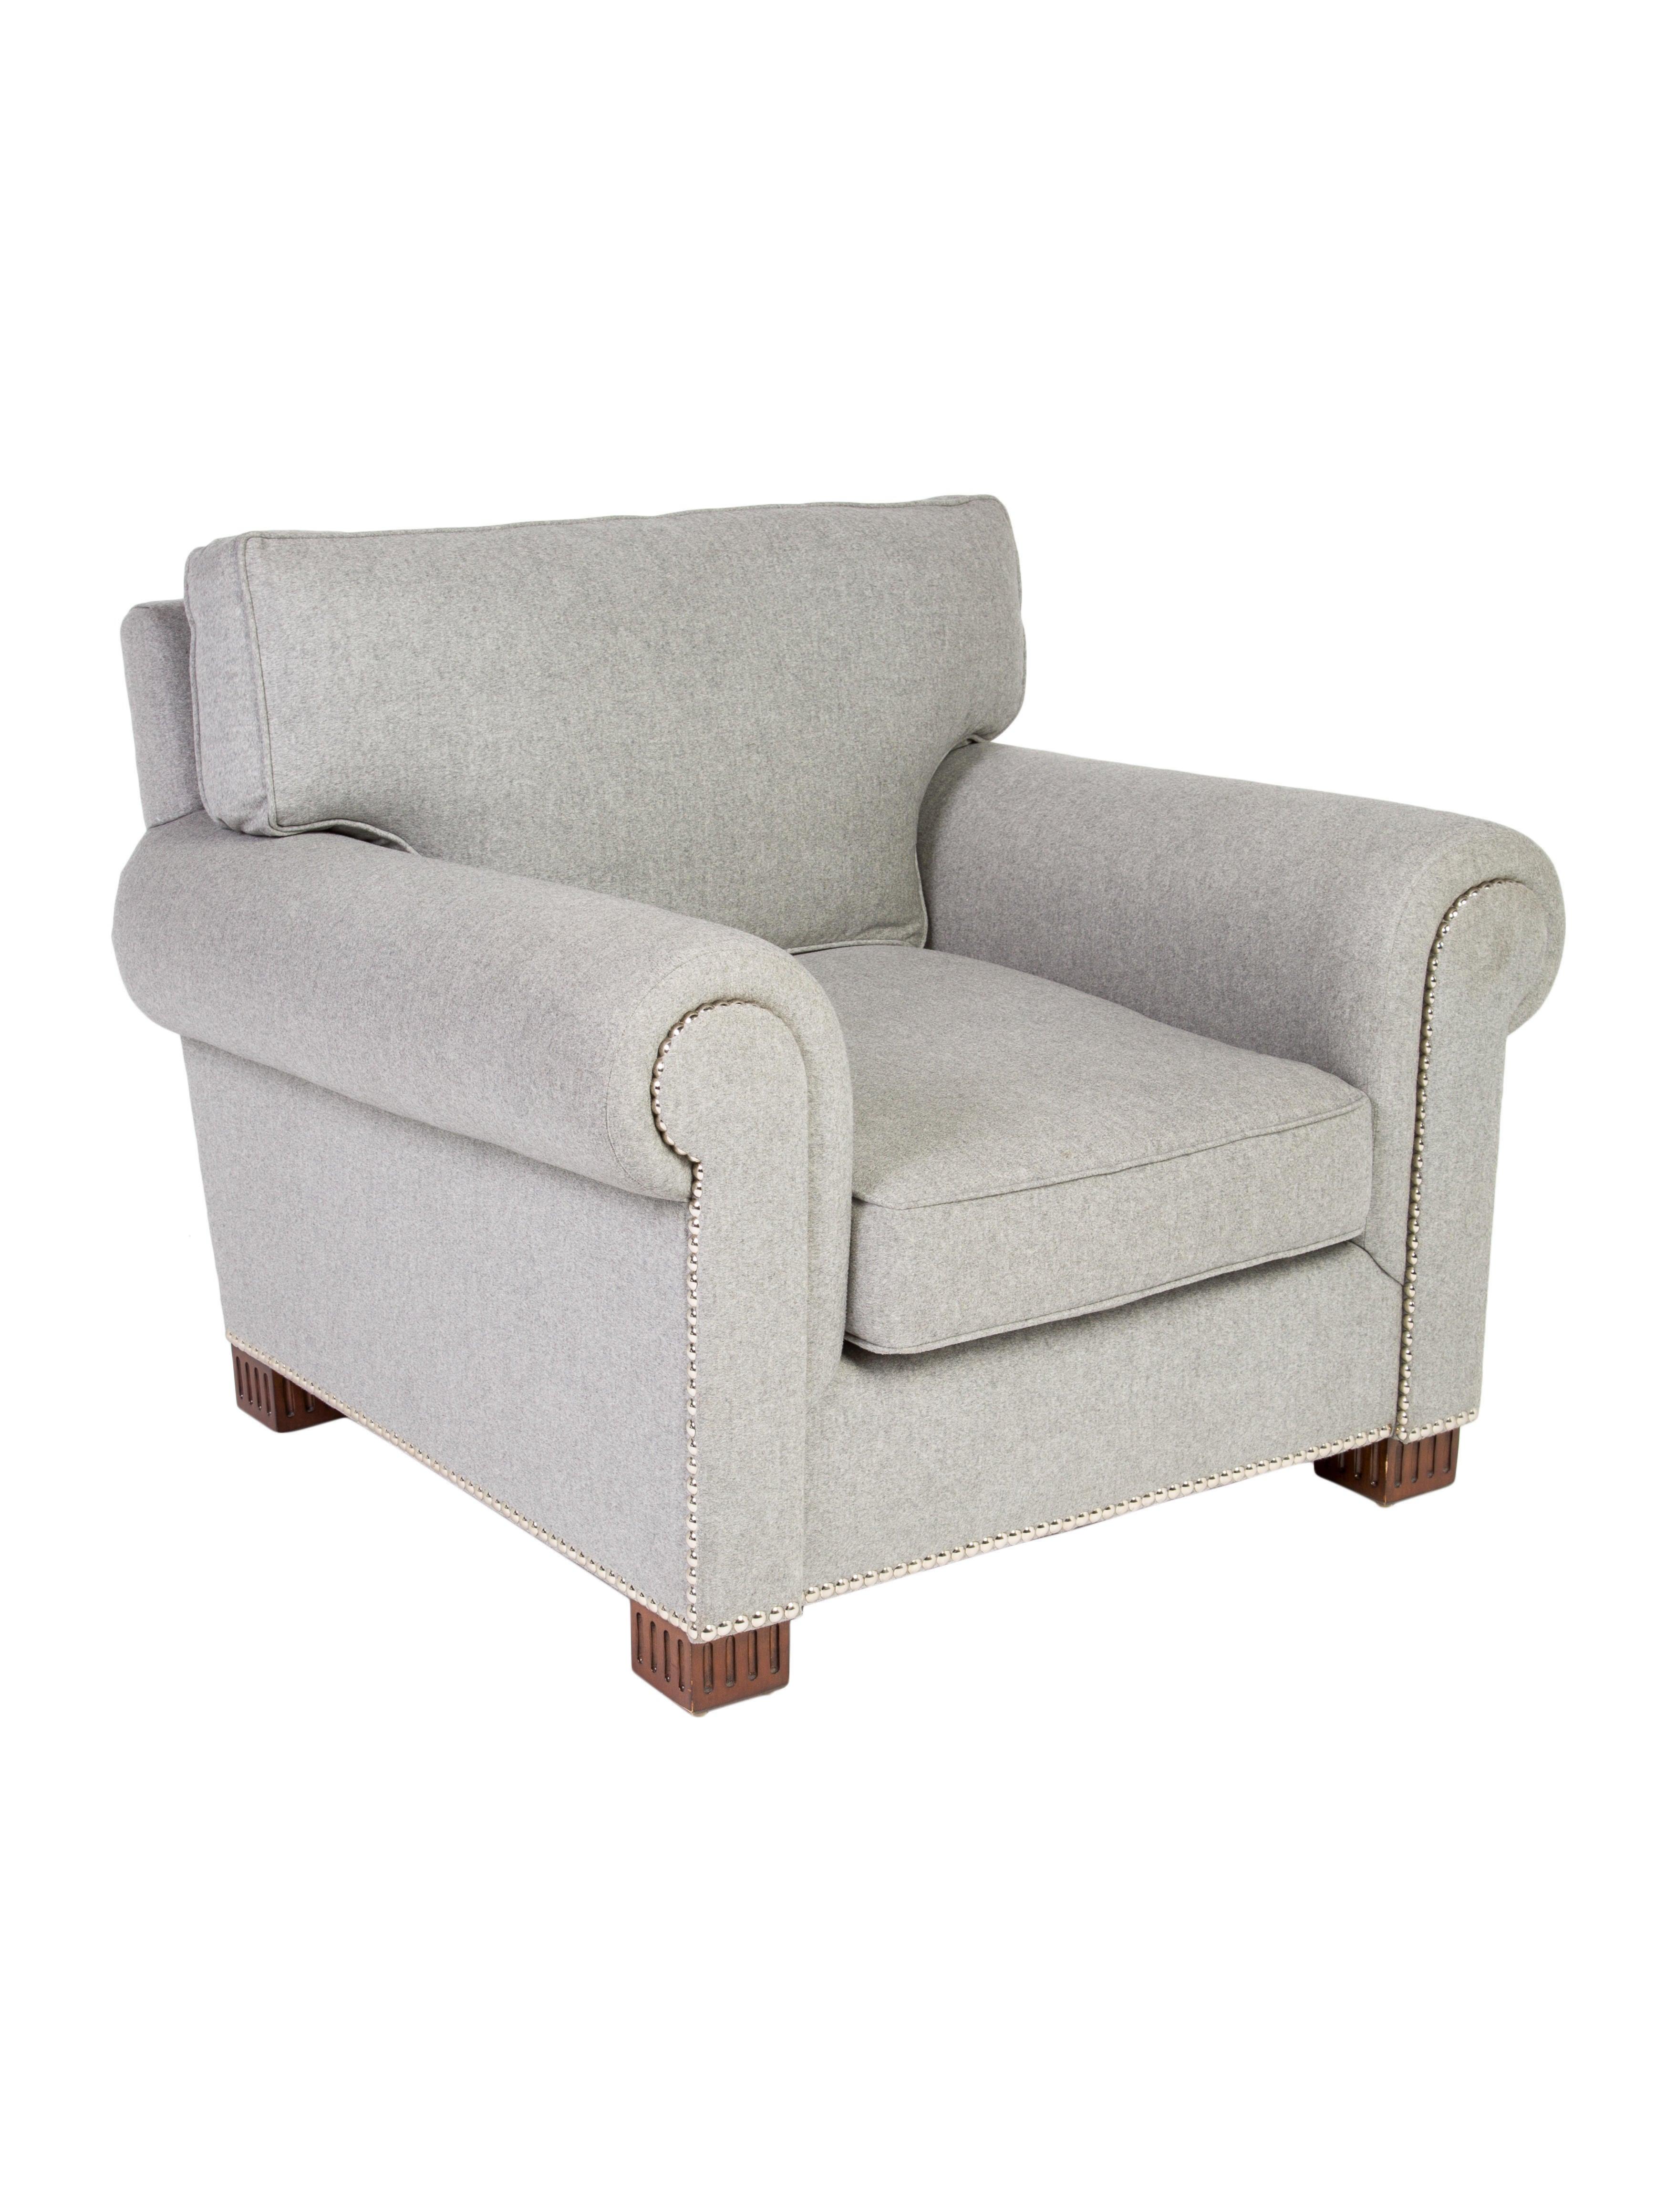 Ralph lauren jamaica chair furniture wyg23101 the for Ralph lauren outdoor furniture